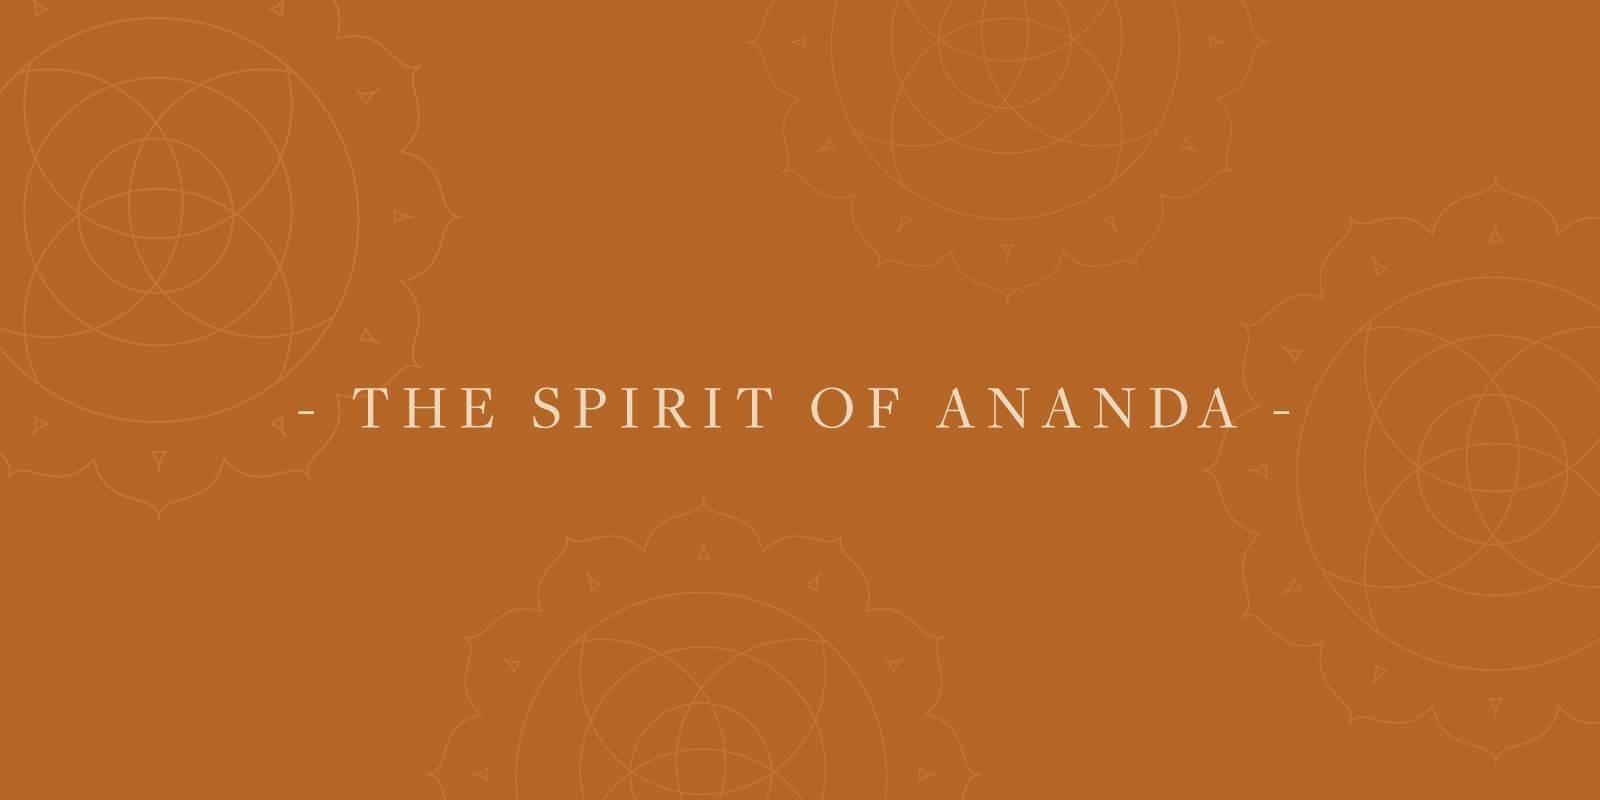 Ananda spiritFB